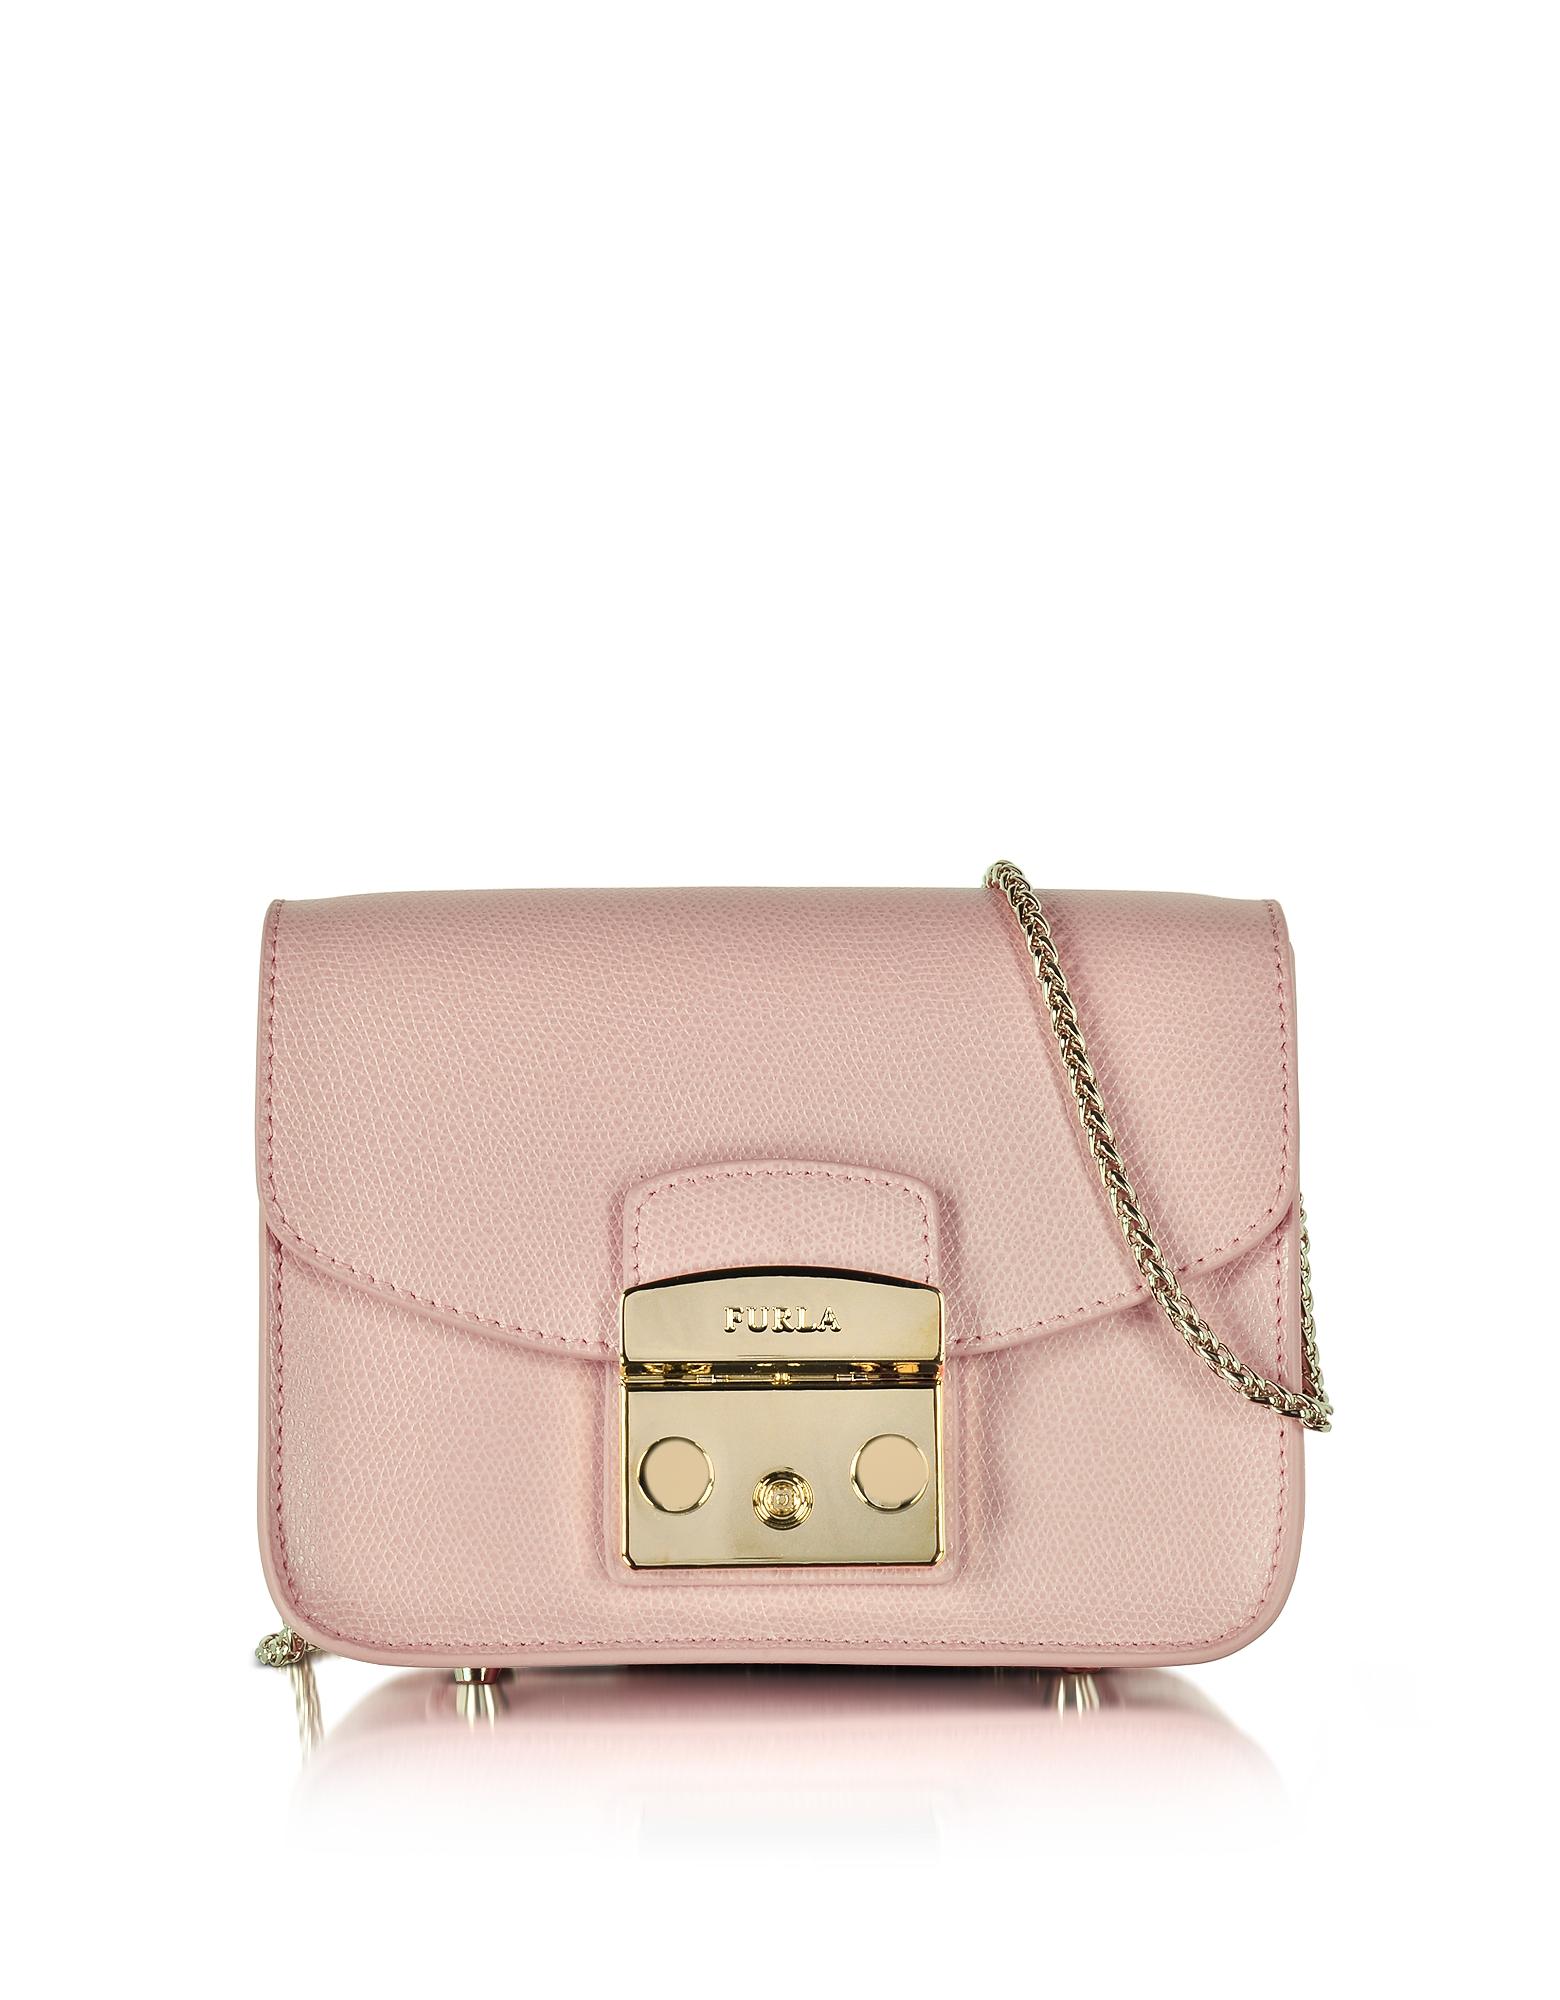 Furla Handbags, Metropolis Moonstone Leather Mini Crossbody Bag